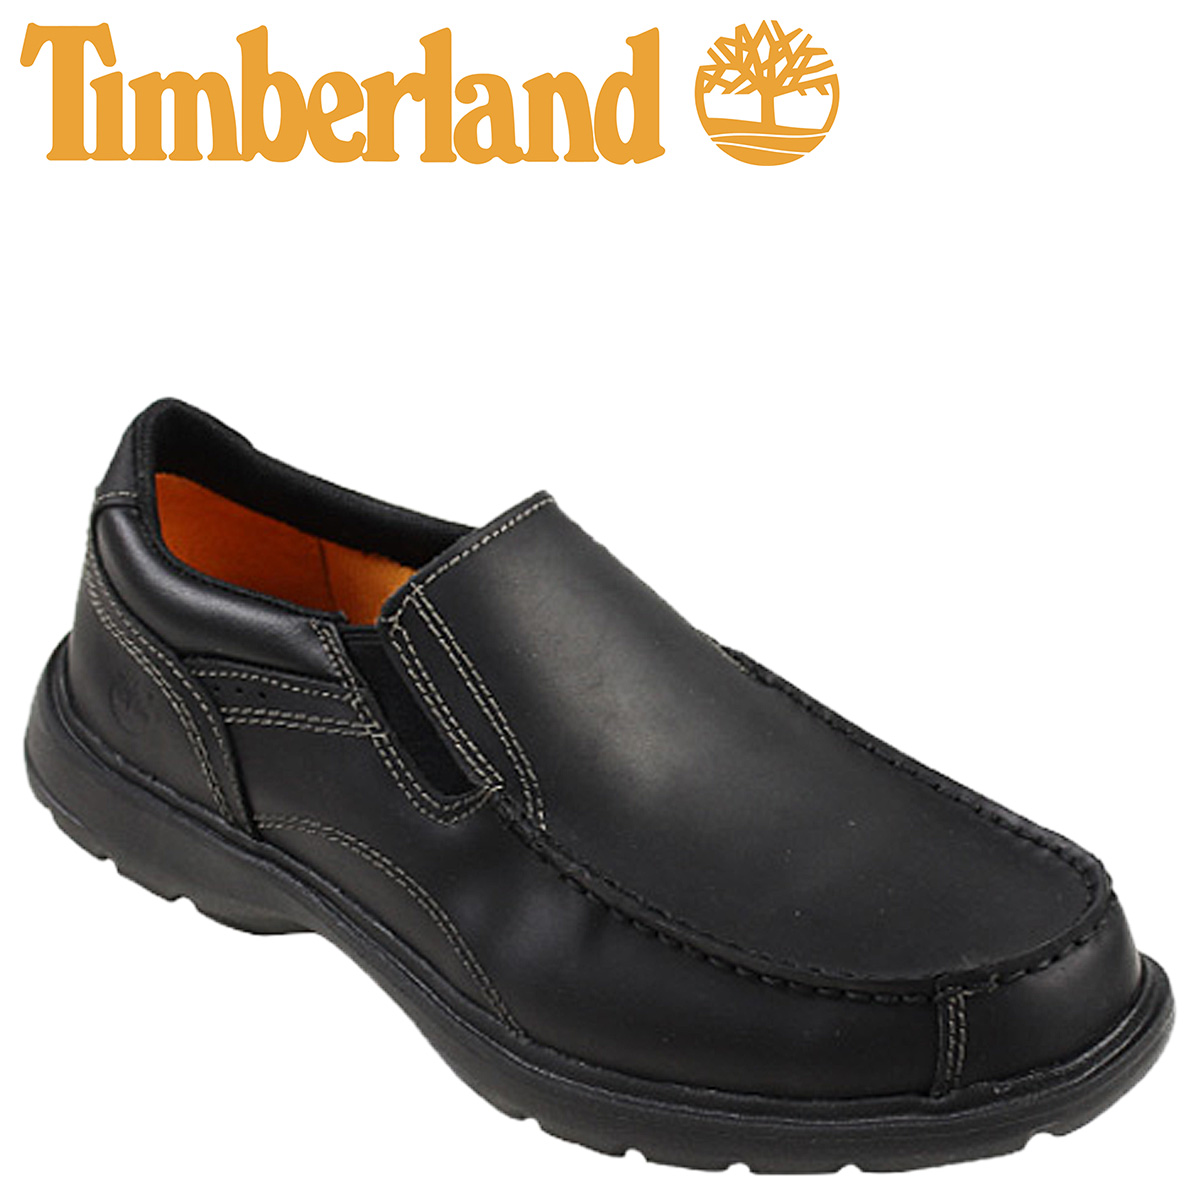 Timberland ??????????????????????????????? EK RICHMONT SLIP ON leather 5,045A black men